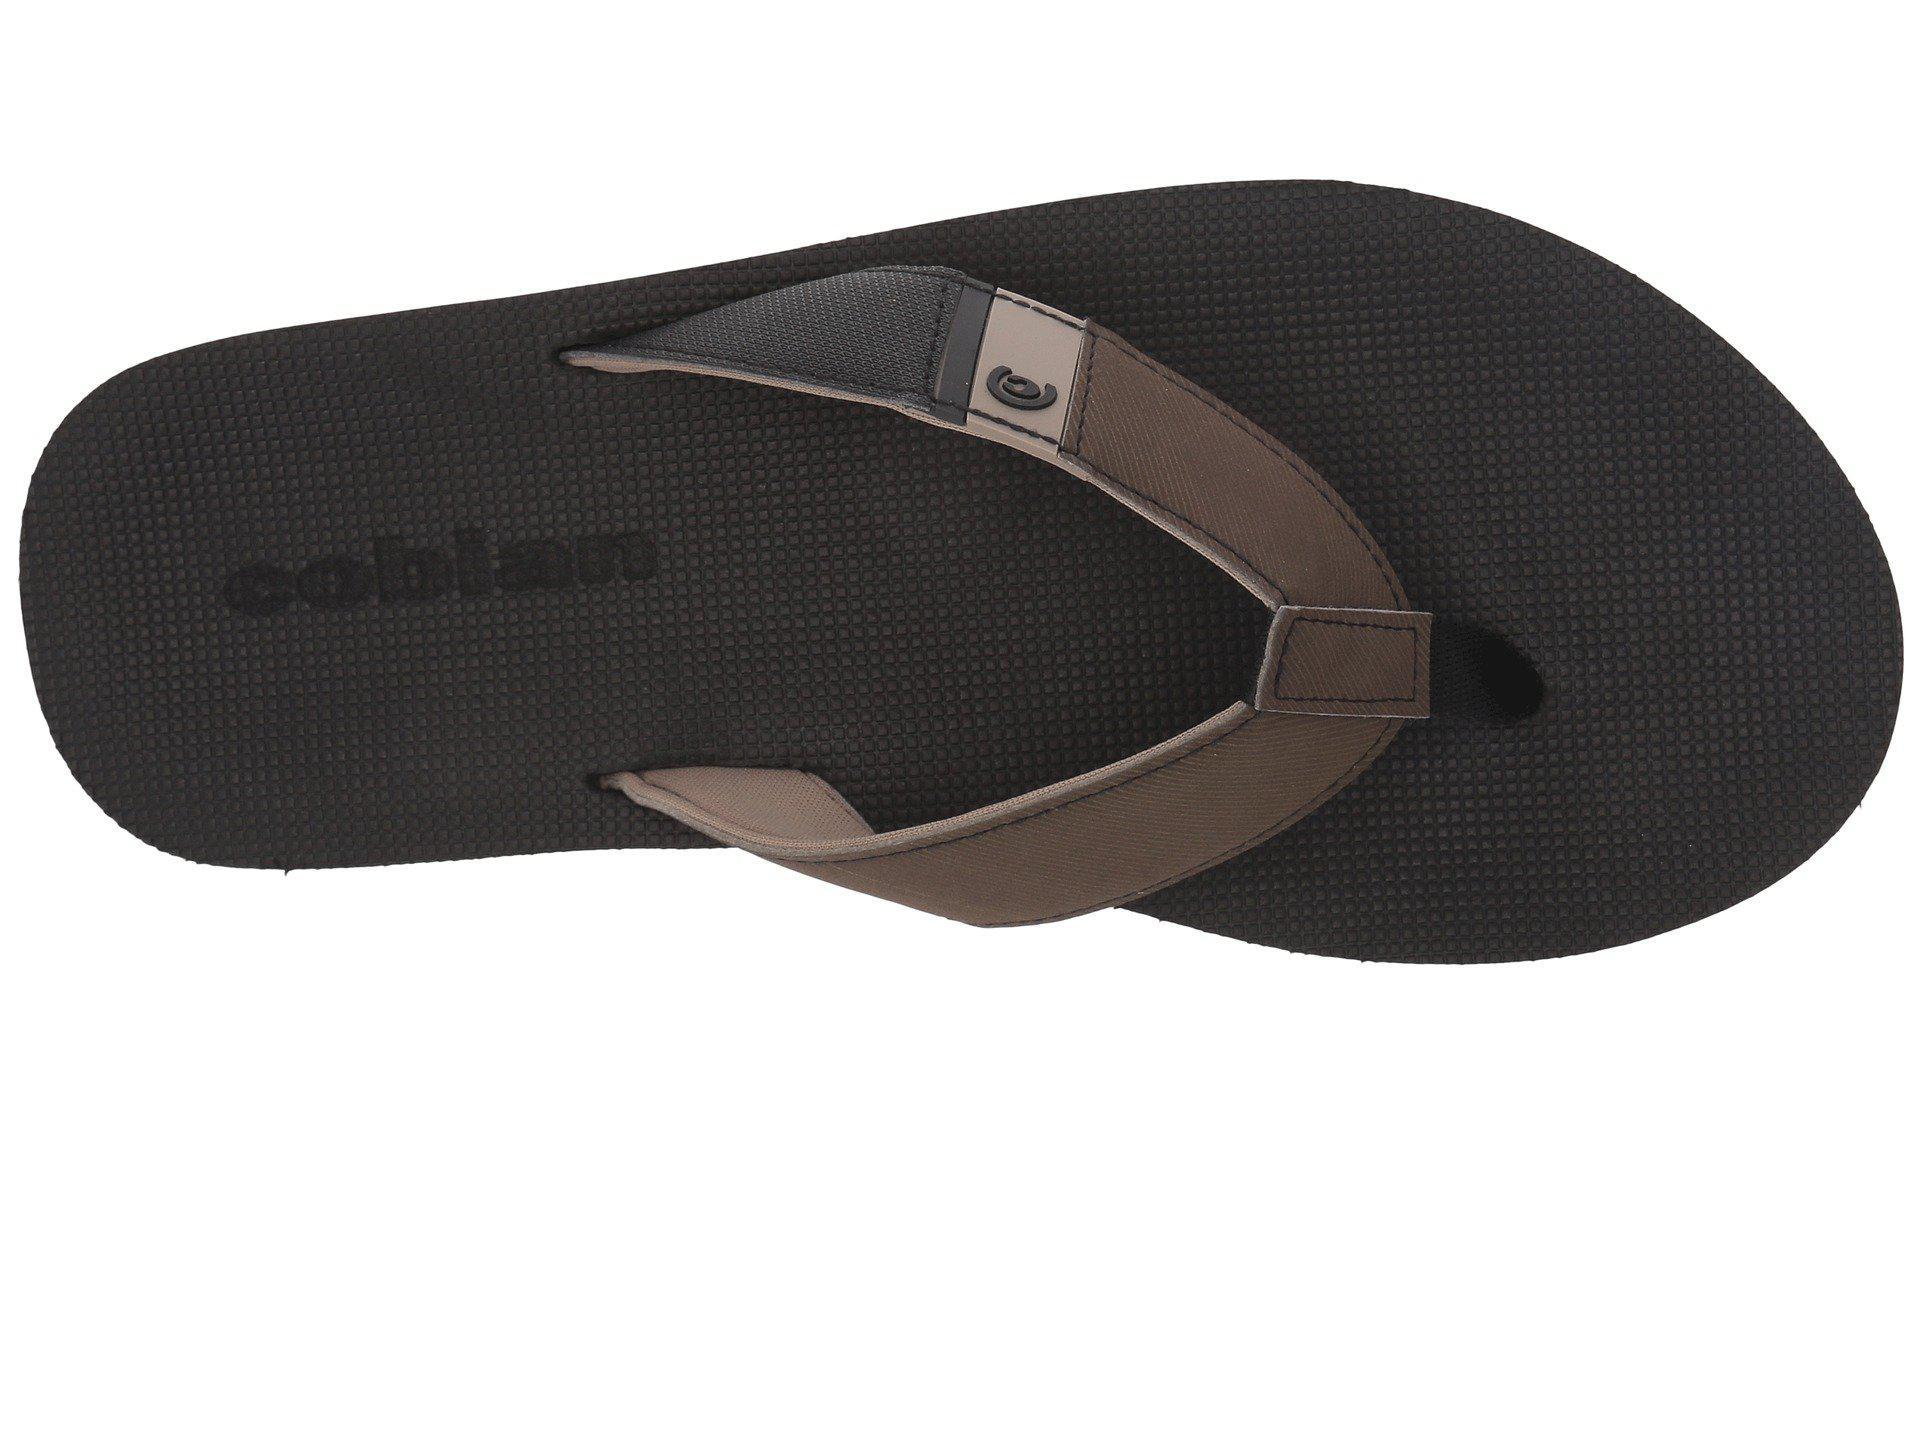 781c50930edd Cobian - Multicolor Beacon (black) Men s Sandals for Men - Lyst. View  fullscreen